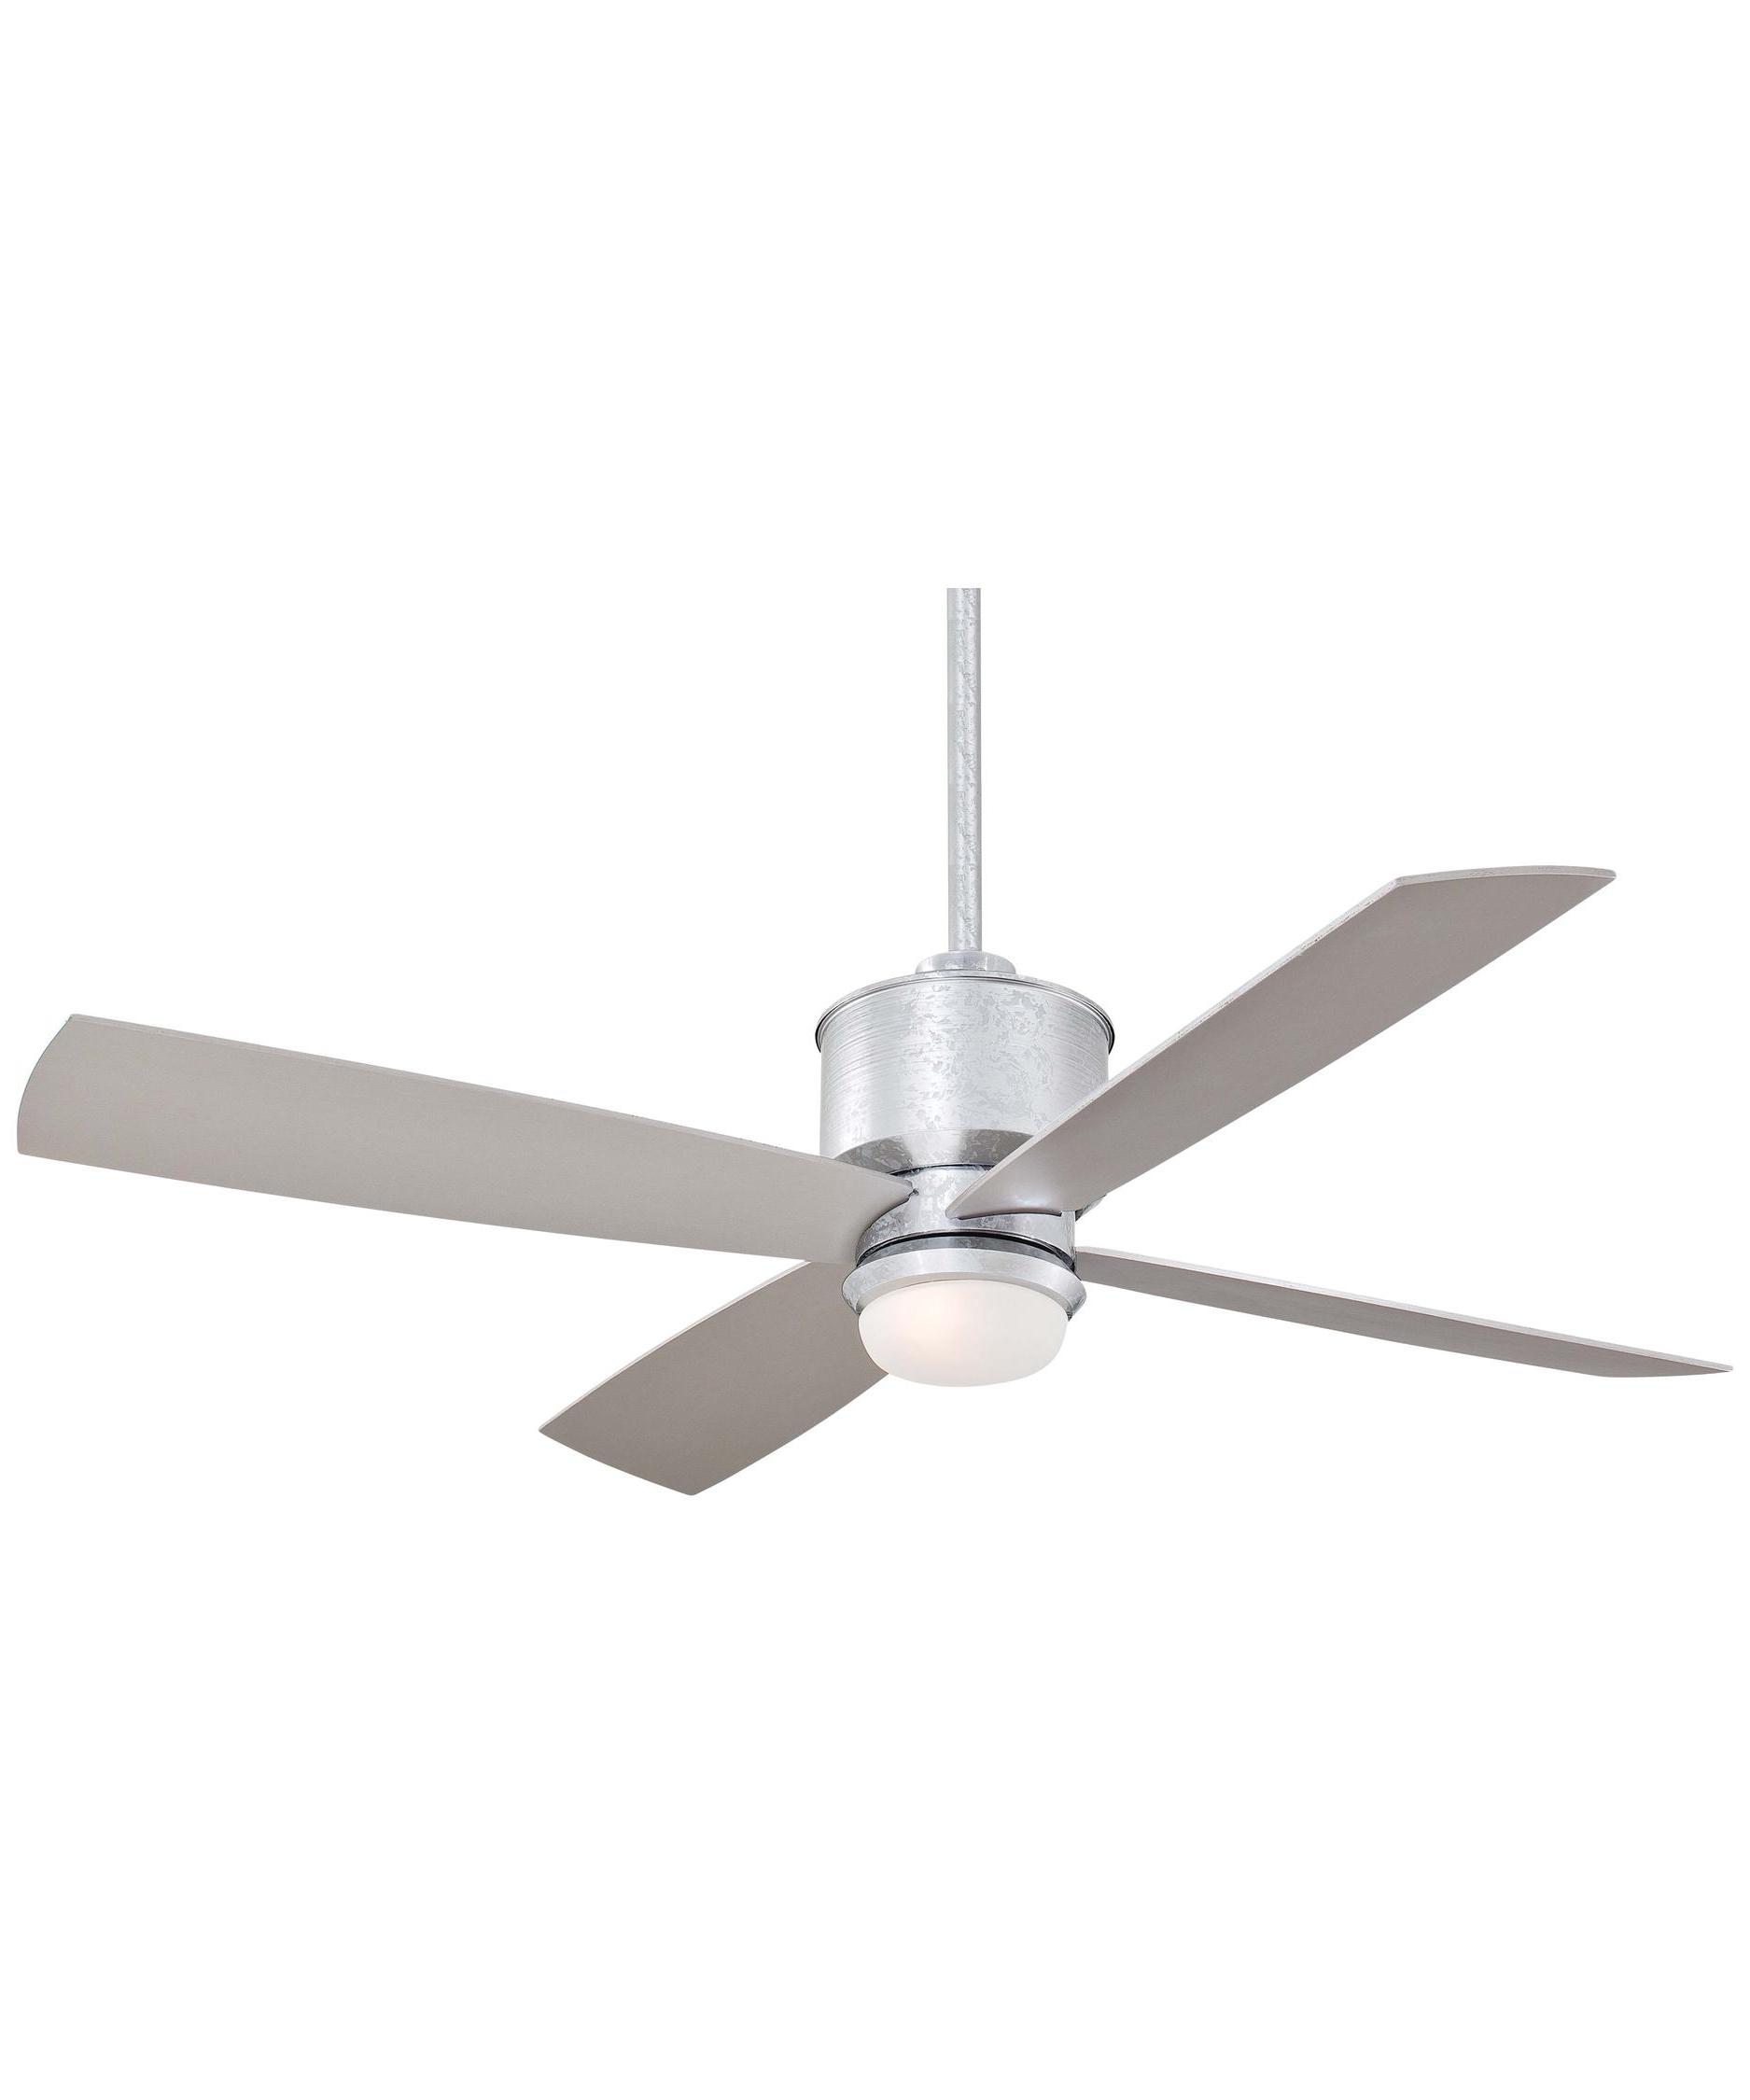 Minka Aire F734 Strata 52 Inch 4 Blade Ceiling Fan (Gallery 7 of 20)